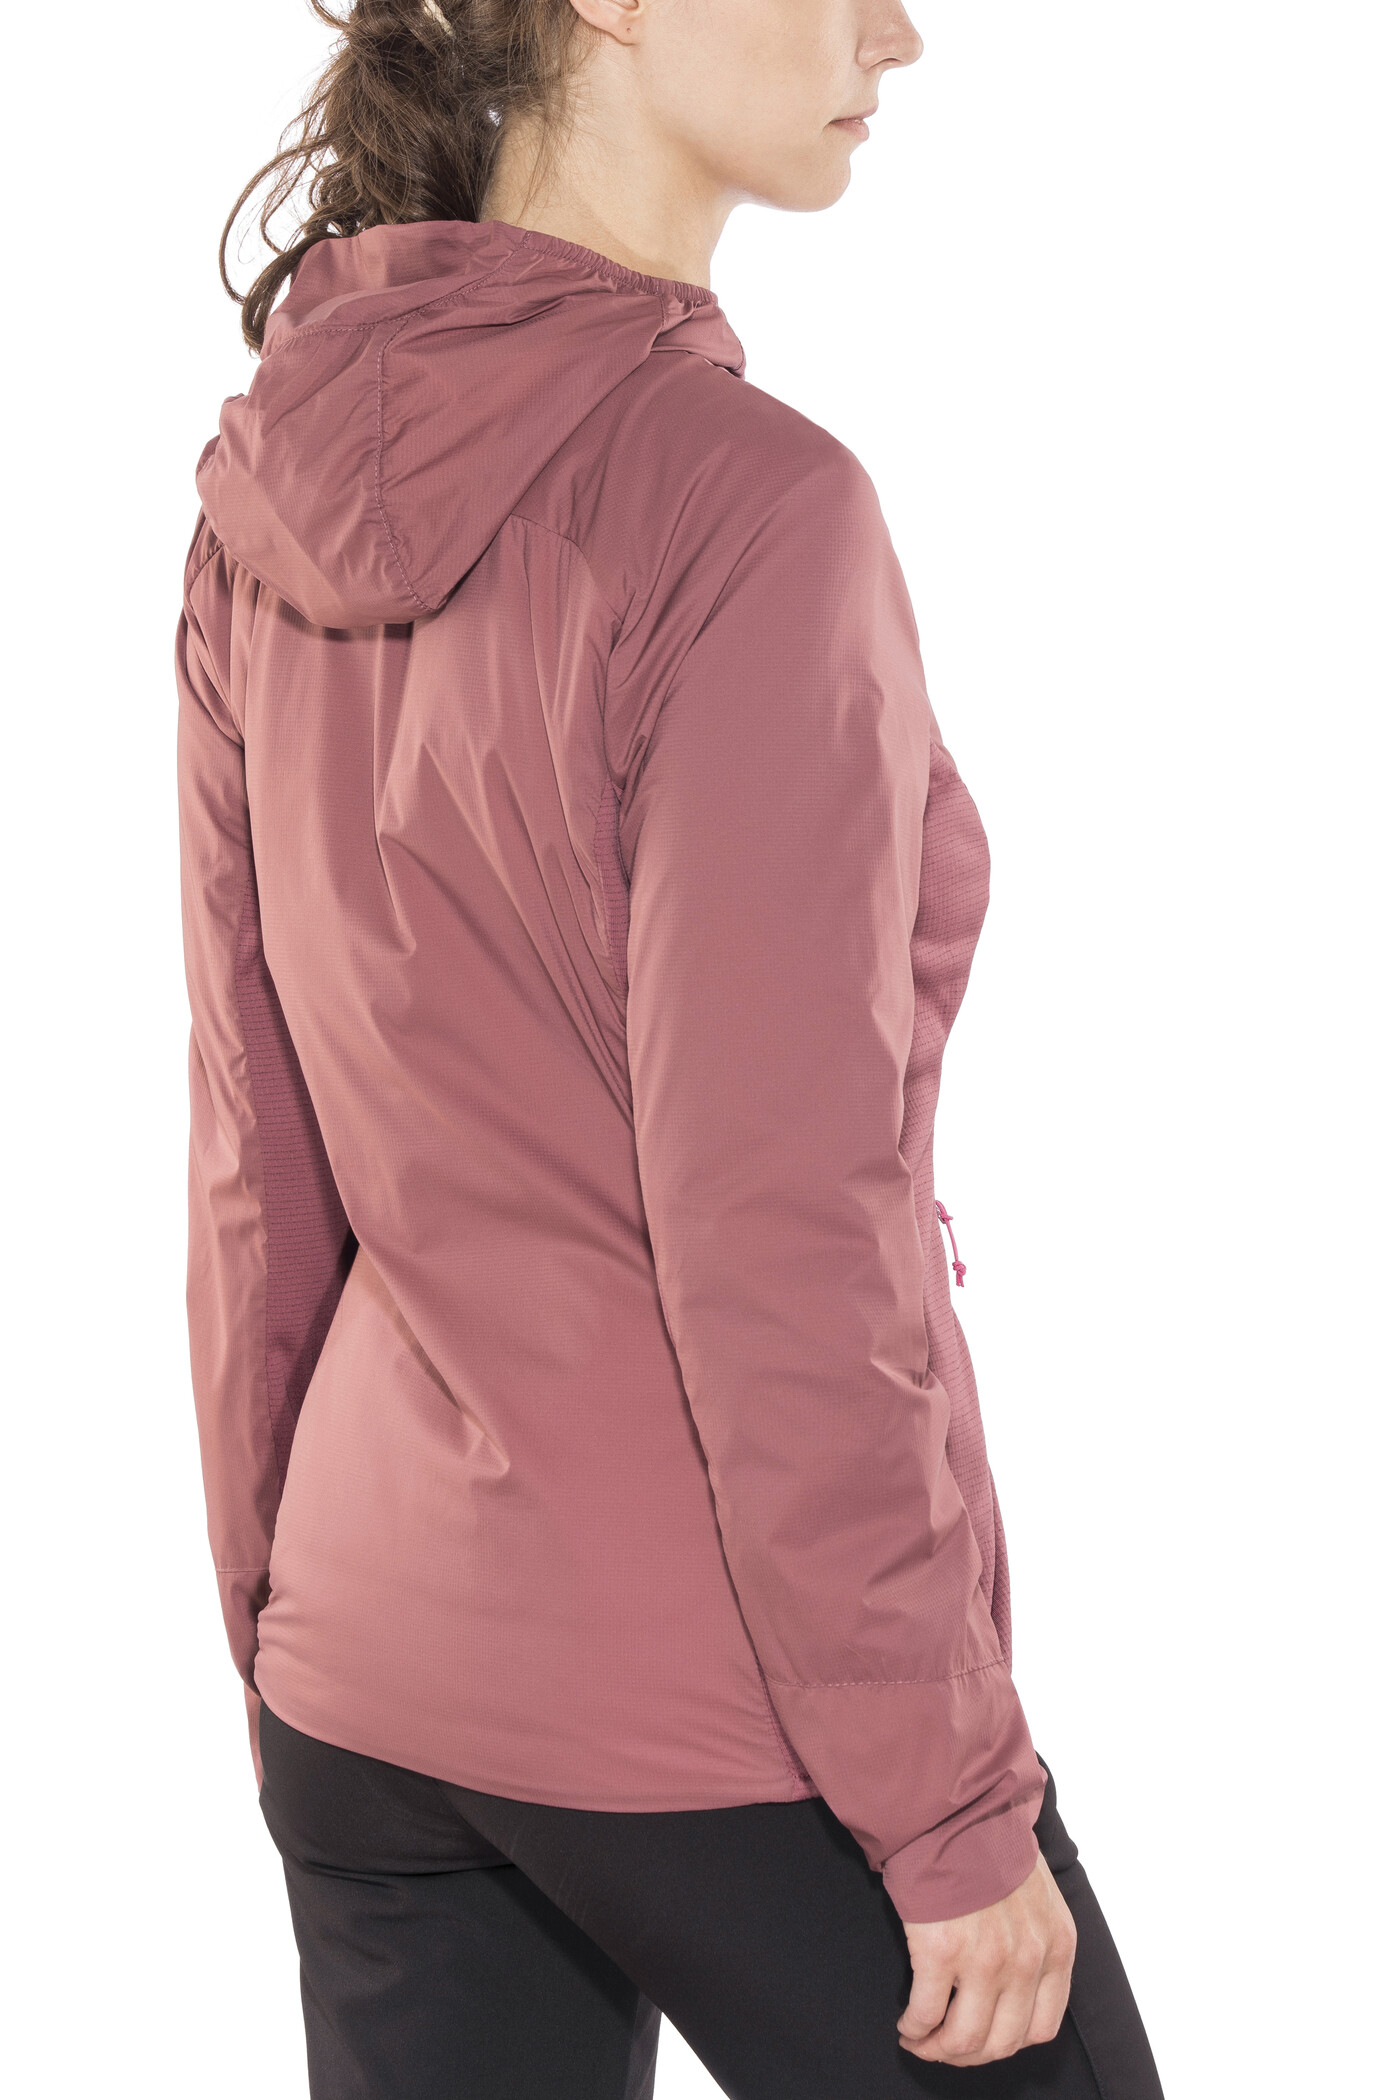 Schöffel Agadir1 Hybrid Jacke Damen roan rouge |